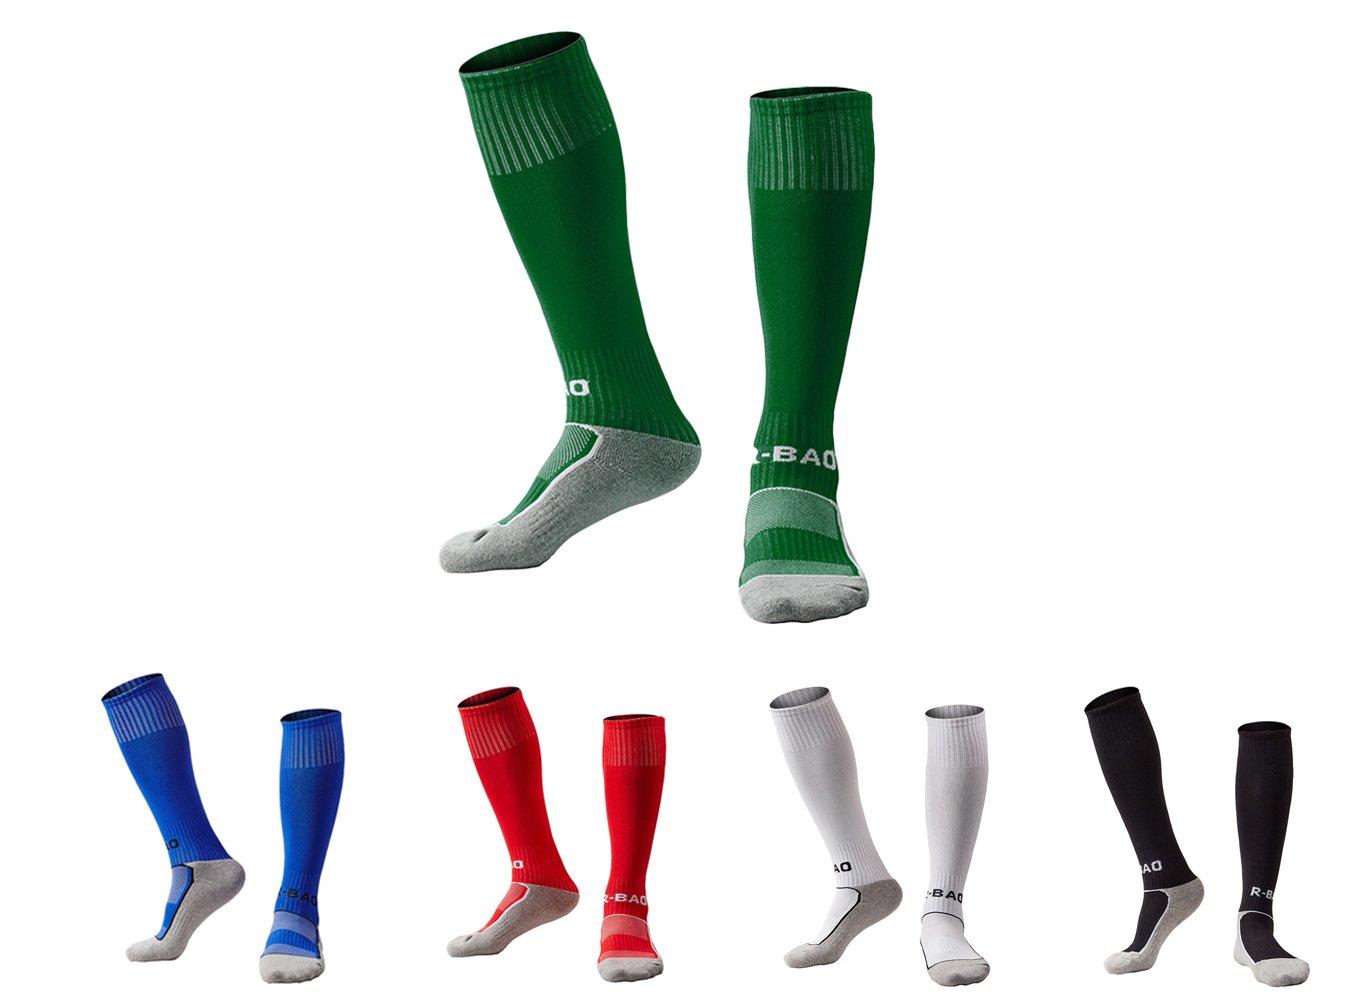 XPKWS SOCKSHOSIERY ボーイズ B077T3763S Green + Blue + Red + White + Black Green + Blue + Red + White + Black